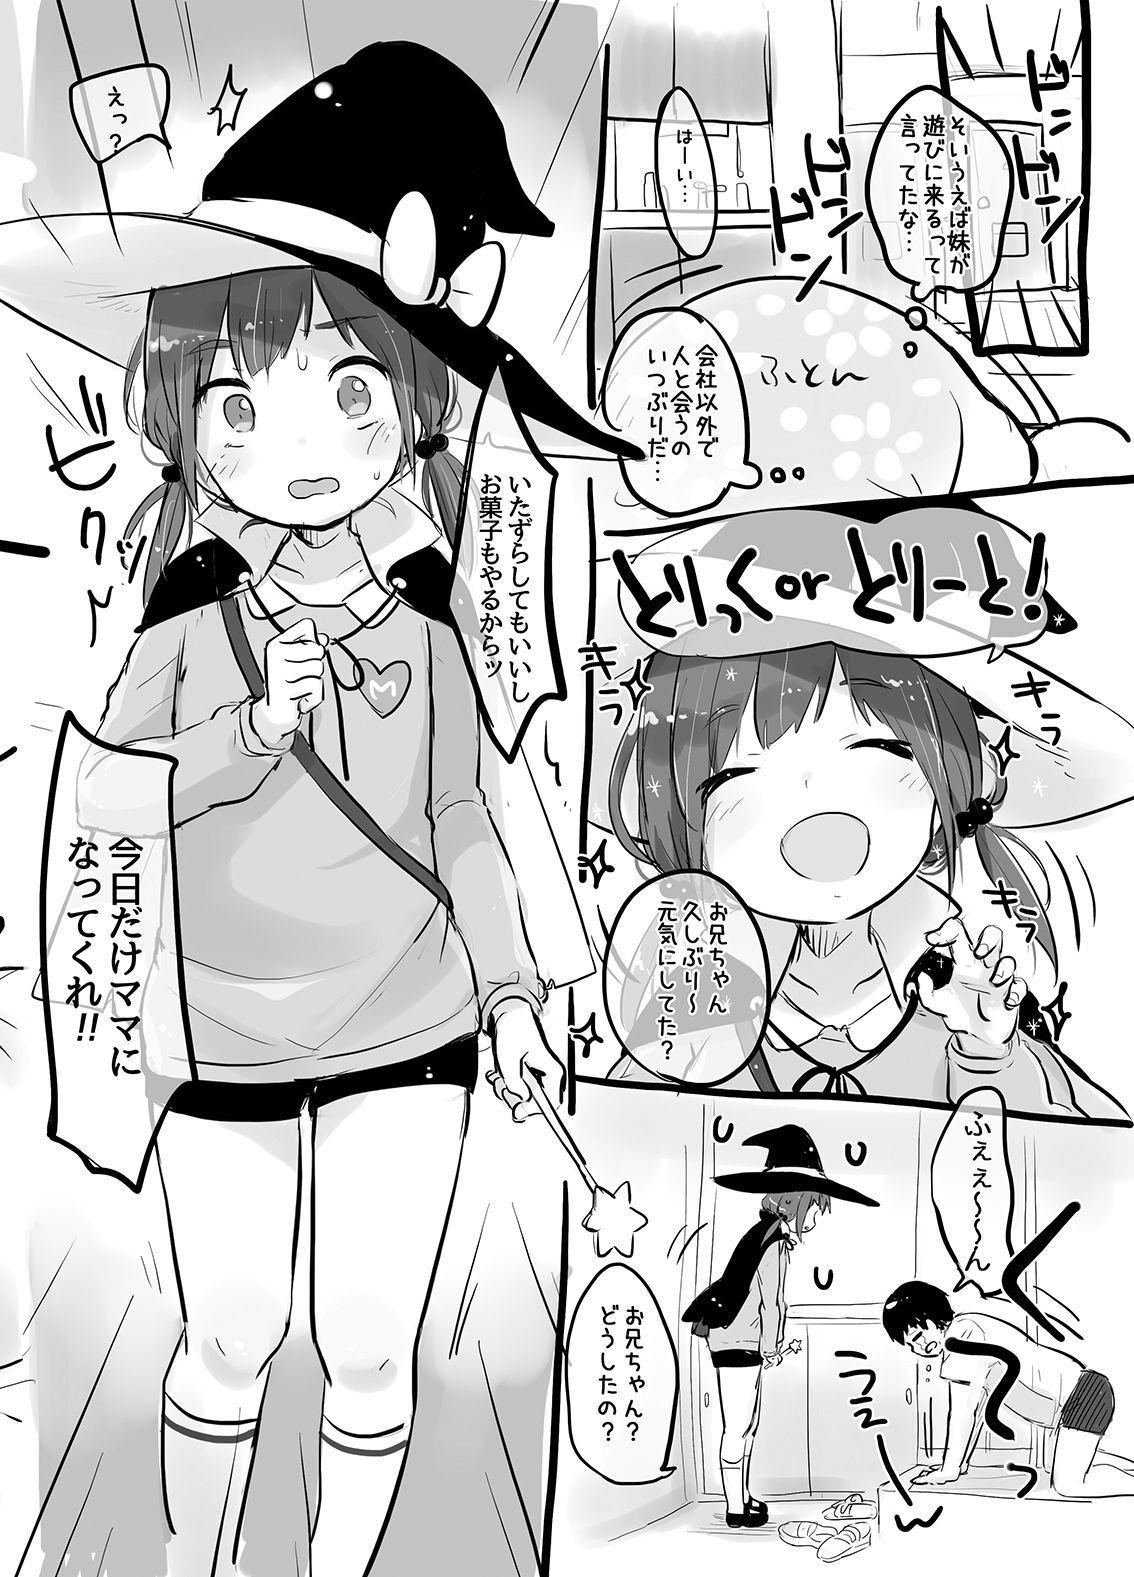 MeltdoWNCOmetおまけ本まとめ 4